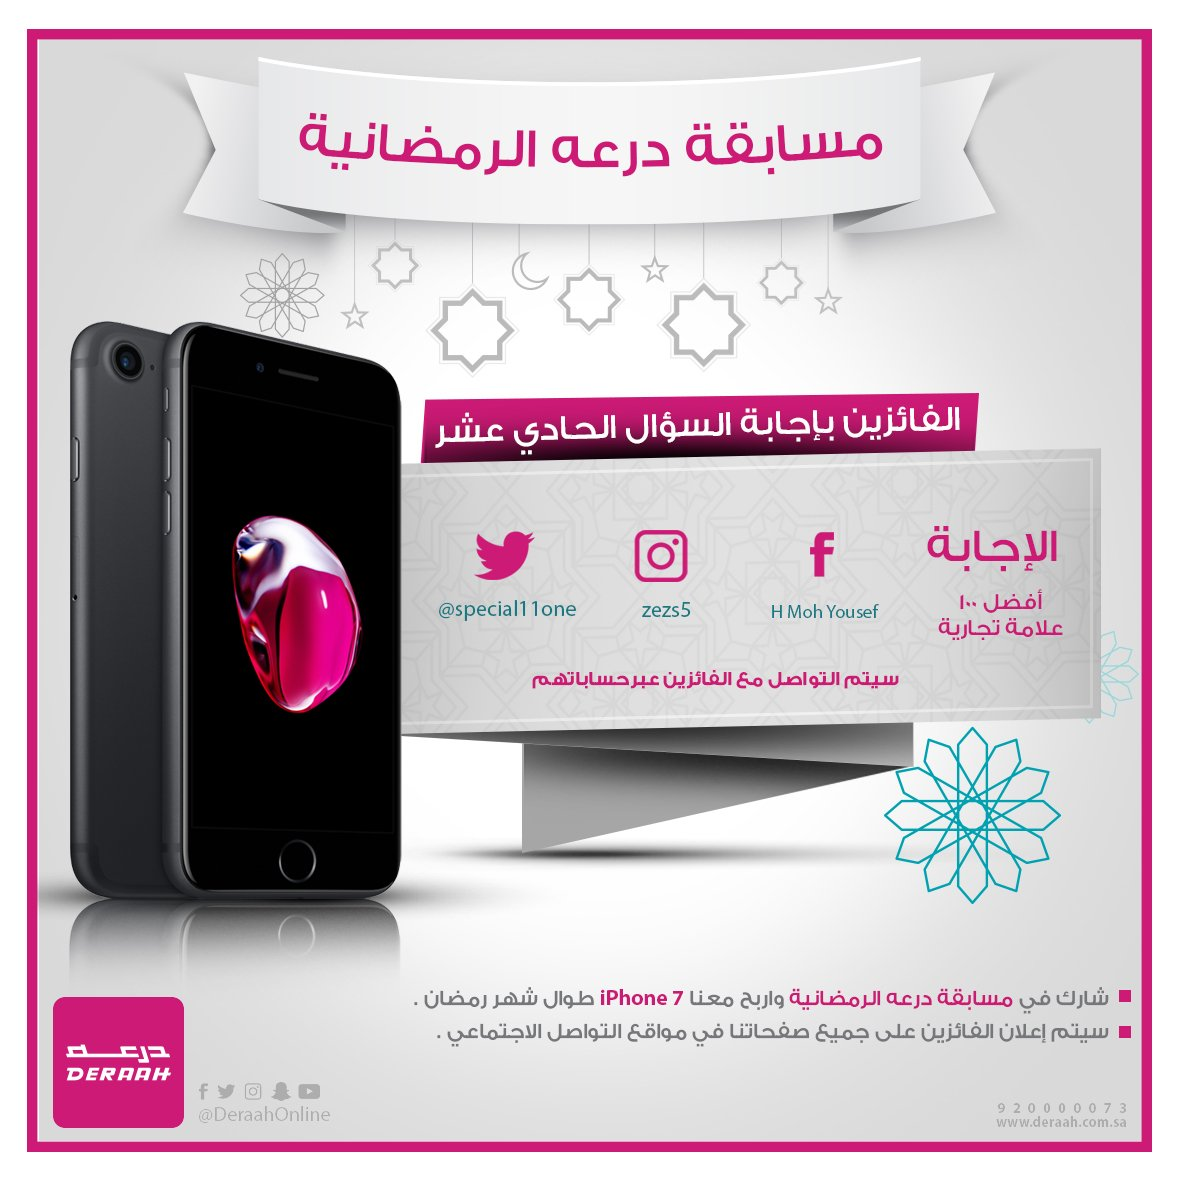 c333ed1ad مسابقة_درعه_الرمضانية_11 hashtag on Twitter